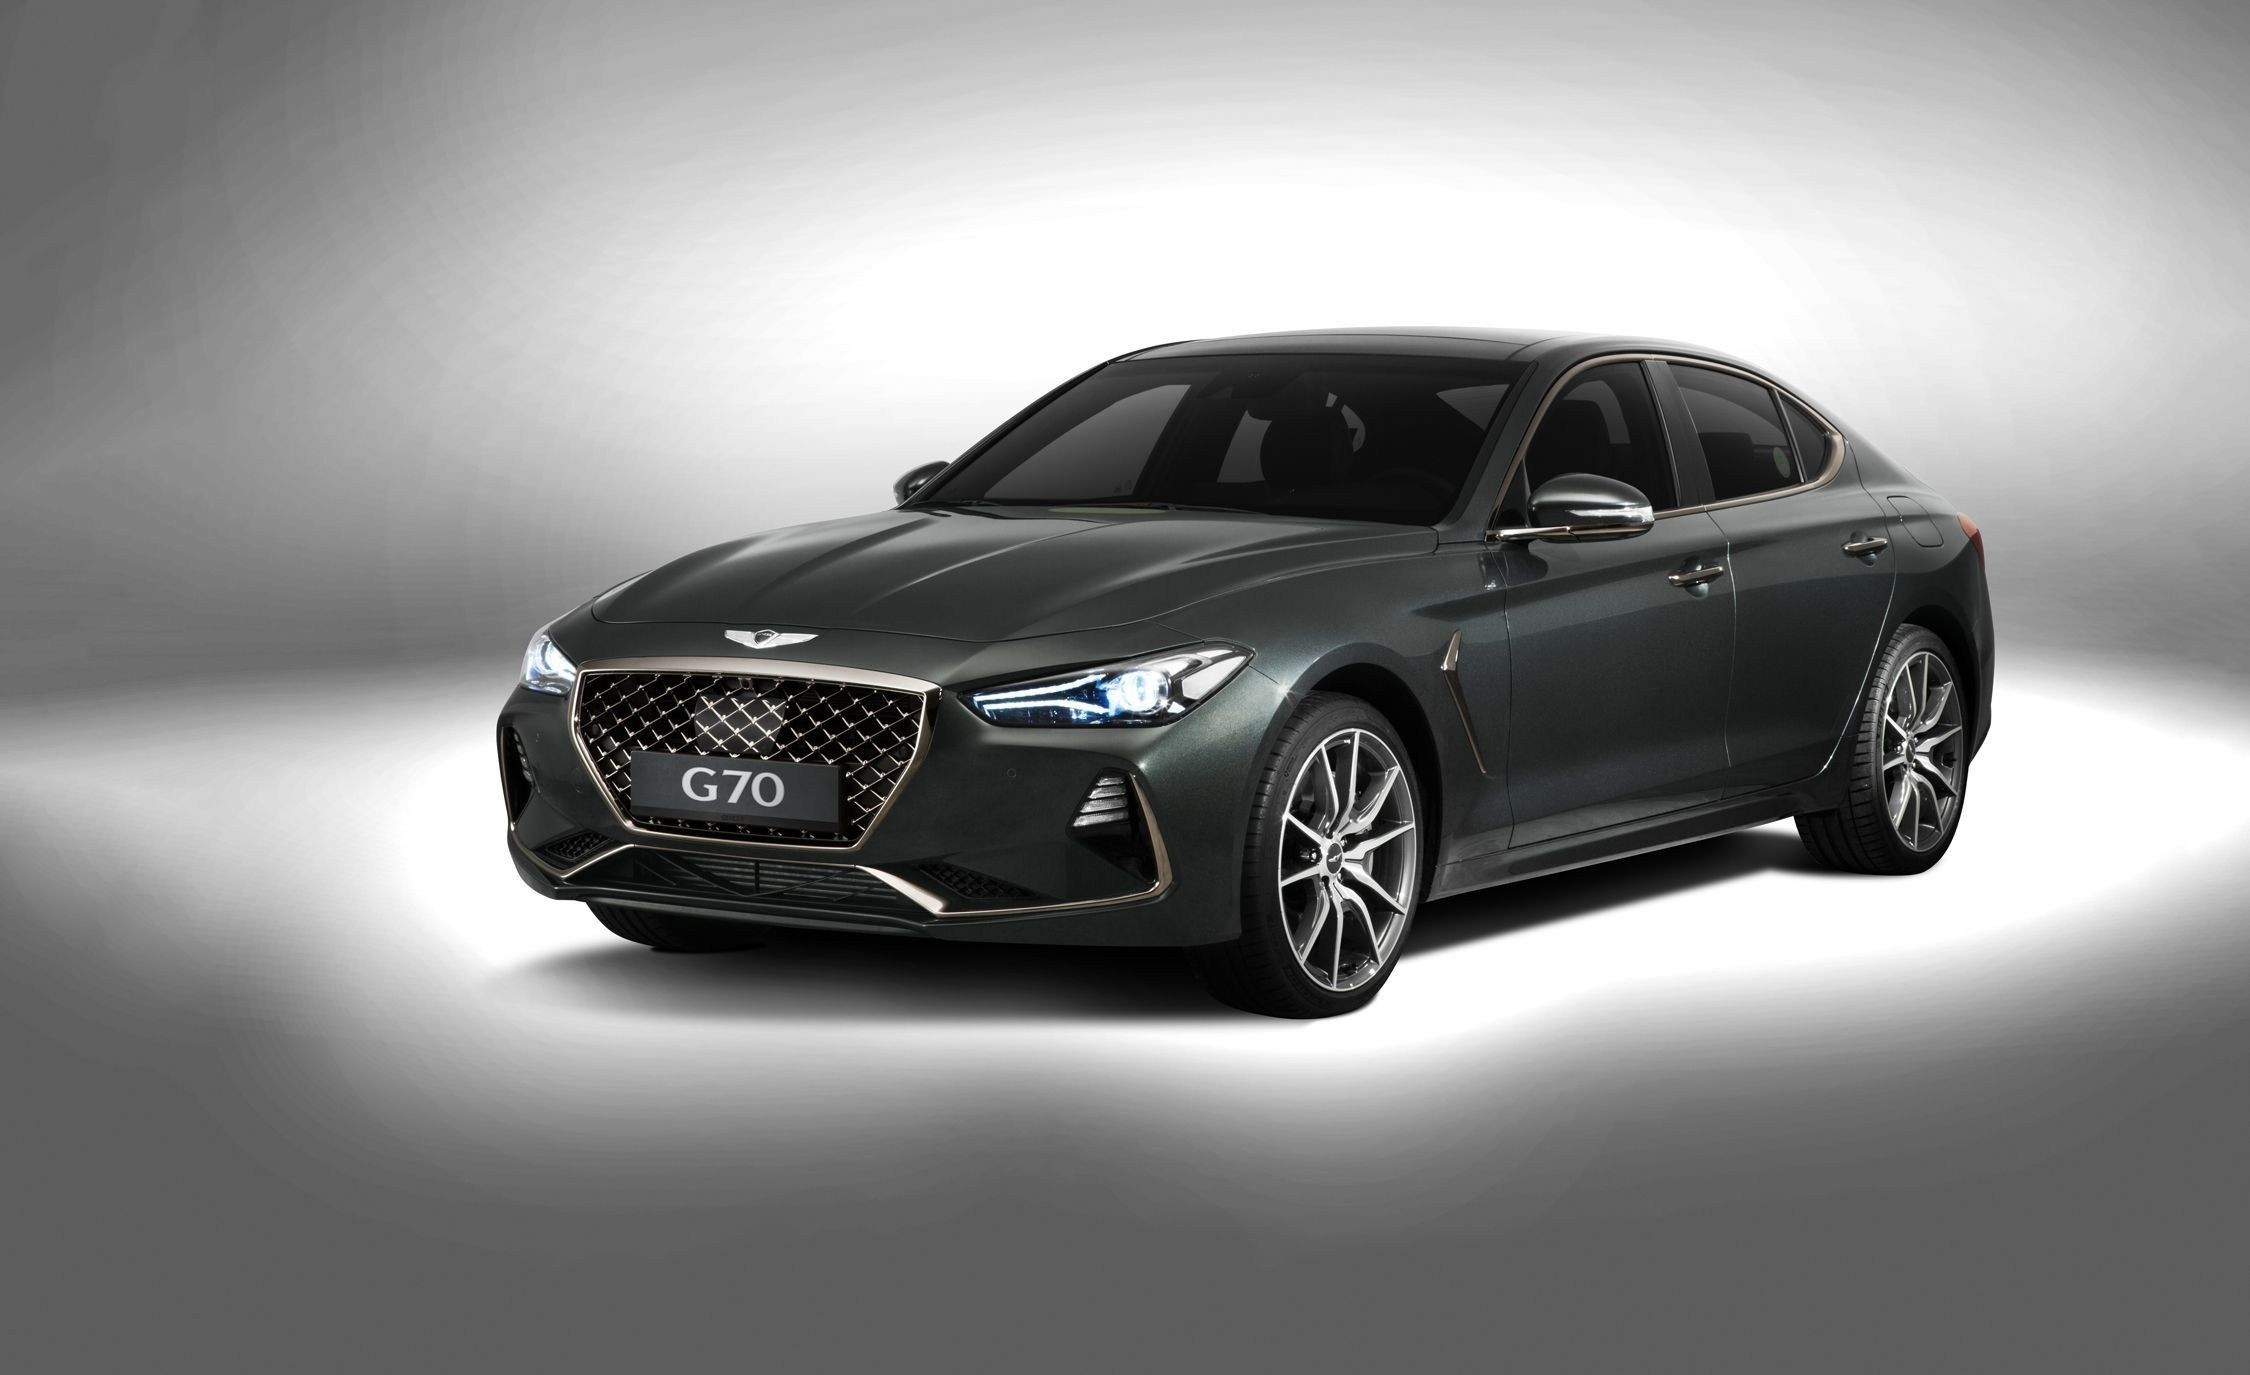 2019 Hyundai Santa Fe New Spy Shots And Redesign News >> 2019 Hyundai Genesis V8 Review Specs And Release Date